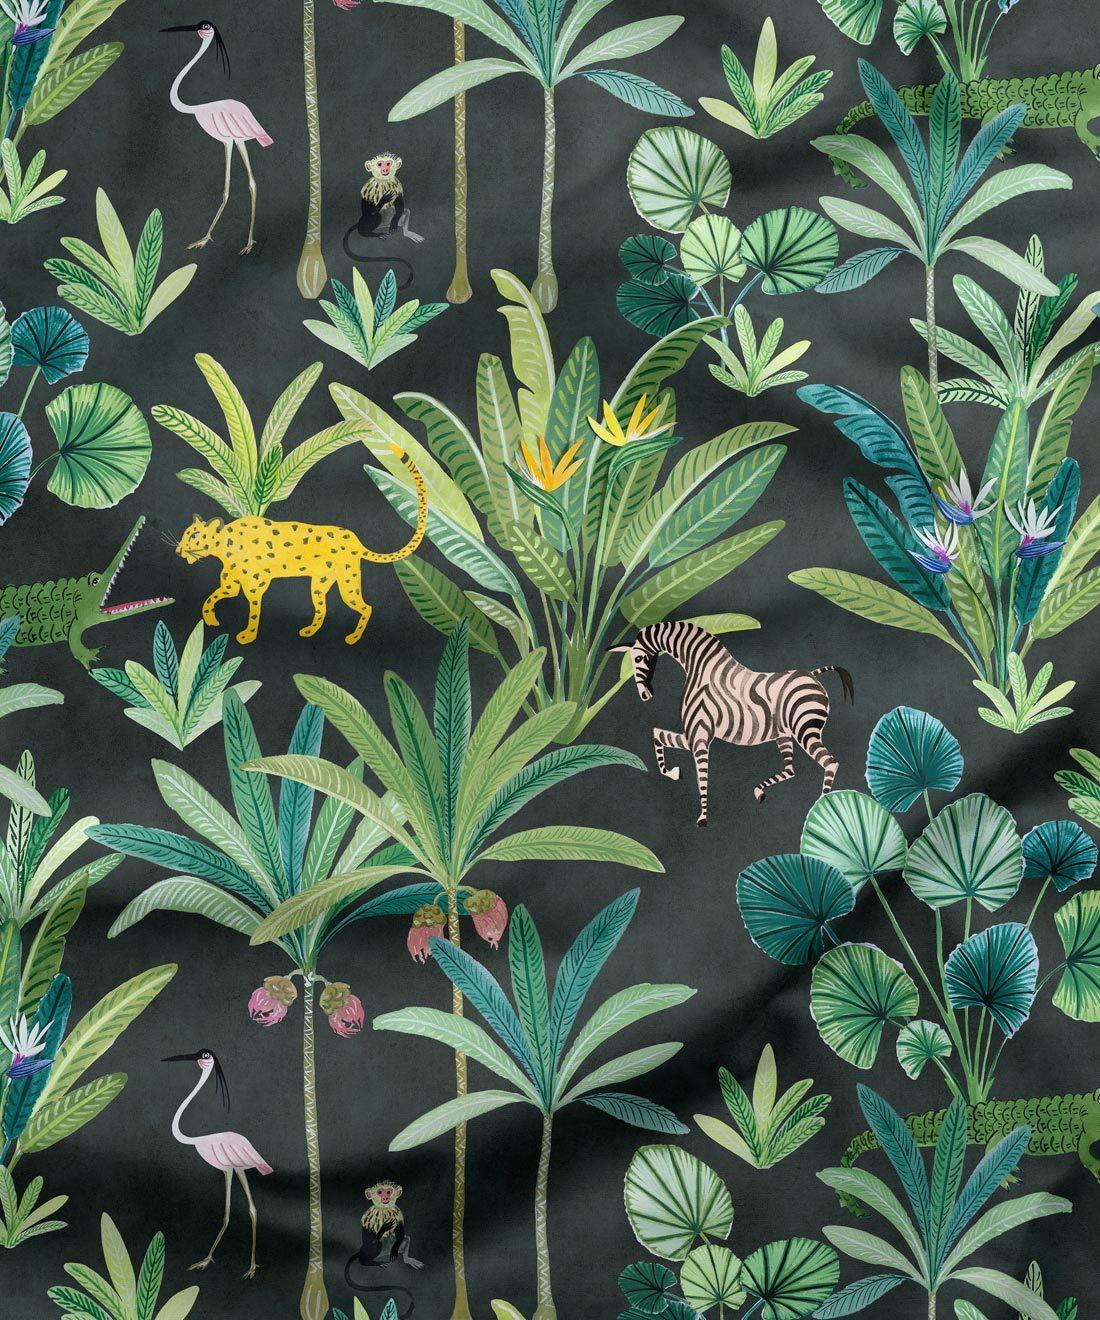 Animal Kingdom Fabric Charcoal